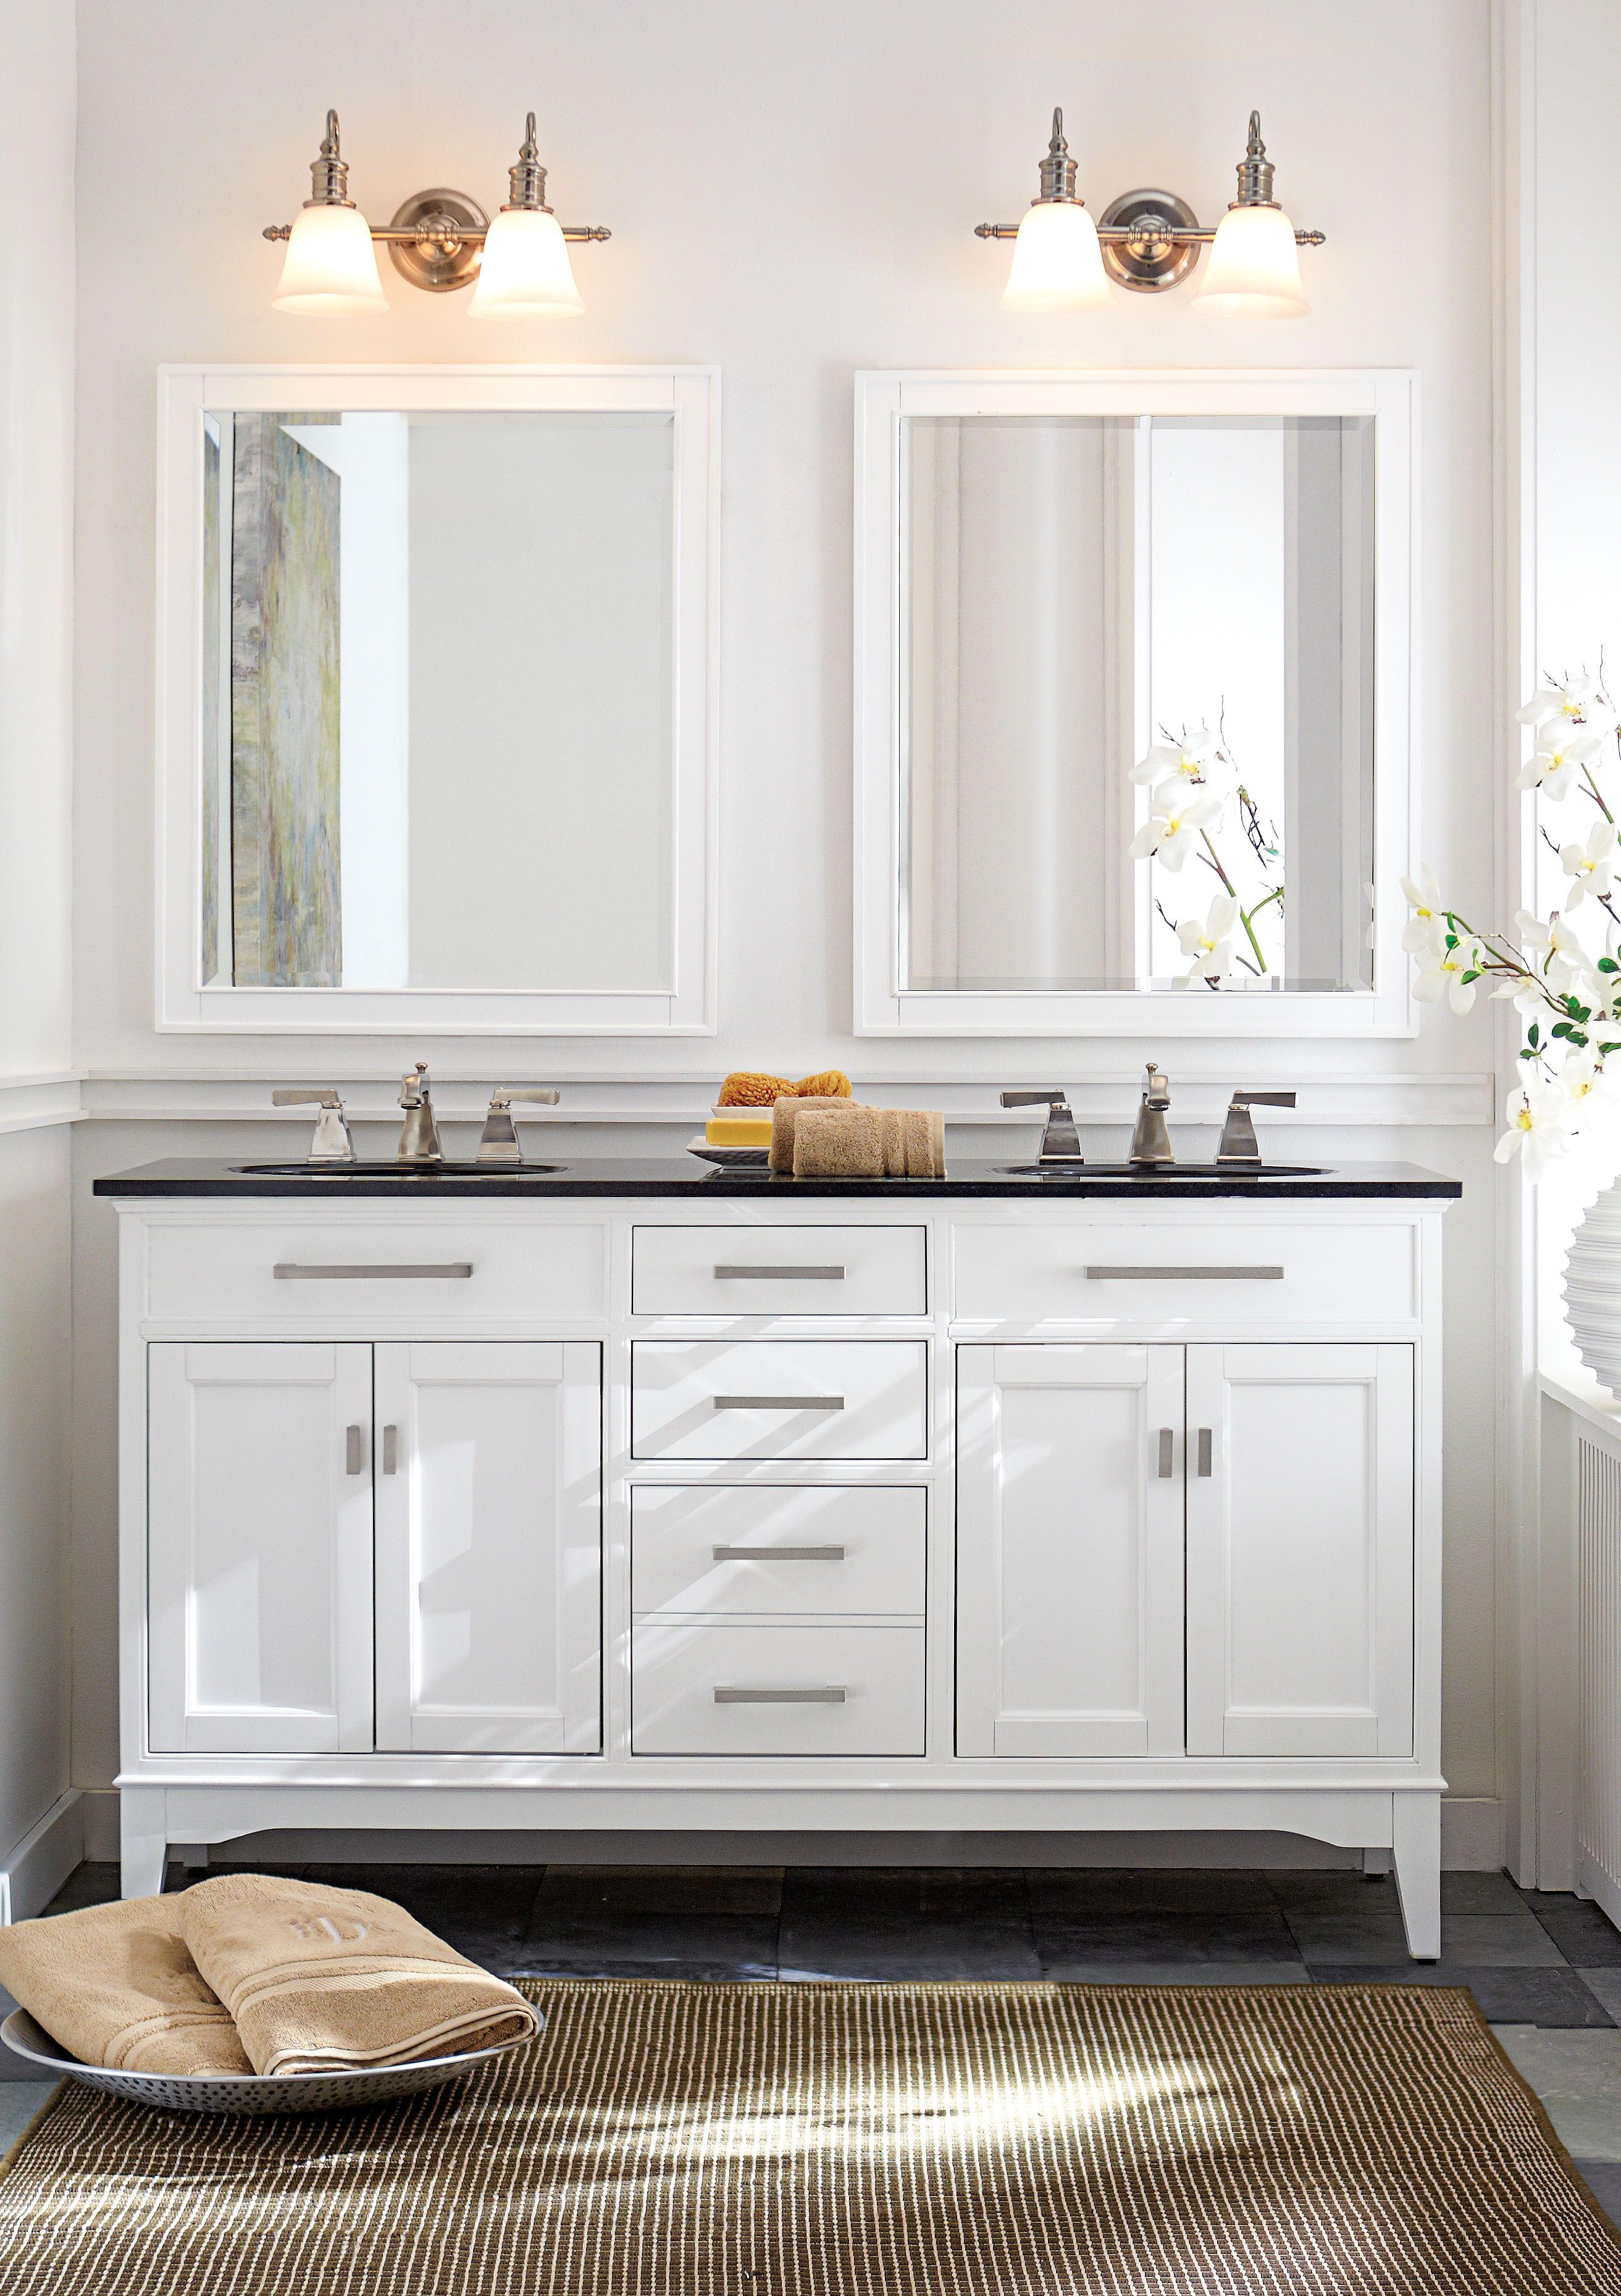 Homedecorators Com Beautiful Bathroom Decor Pinterest Bathroom Ideas Bathroom Remodel Idea